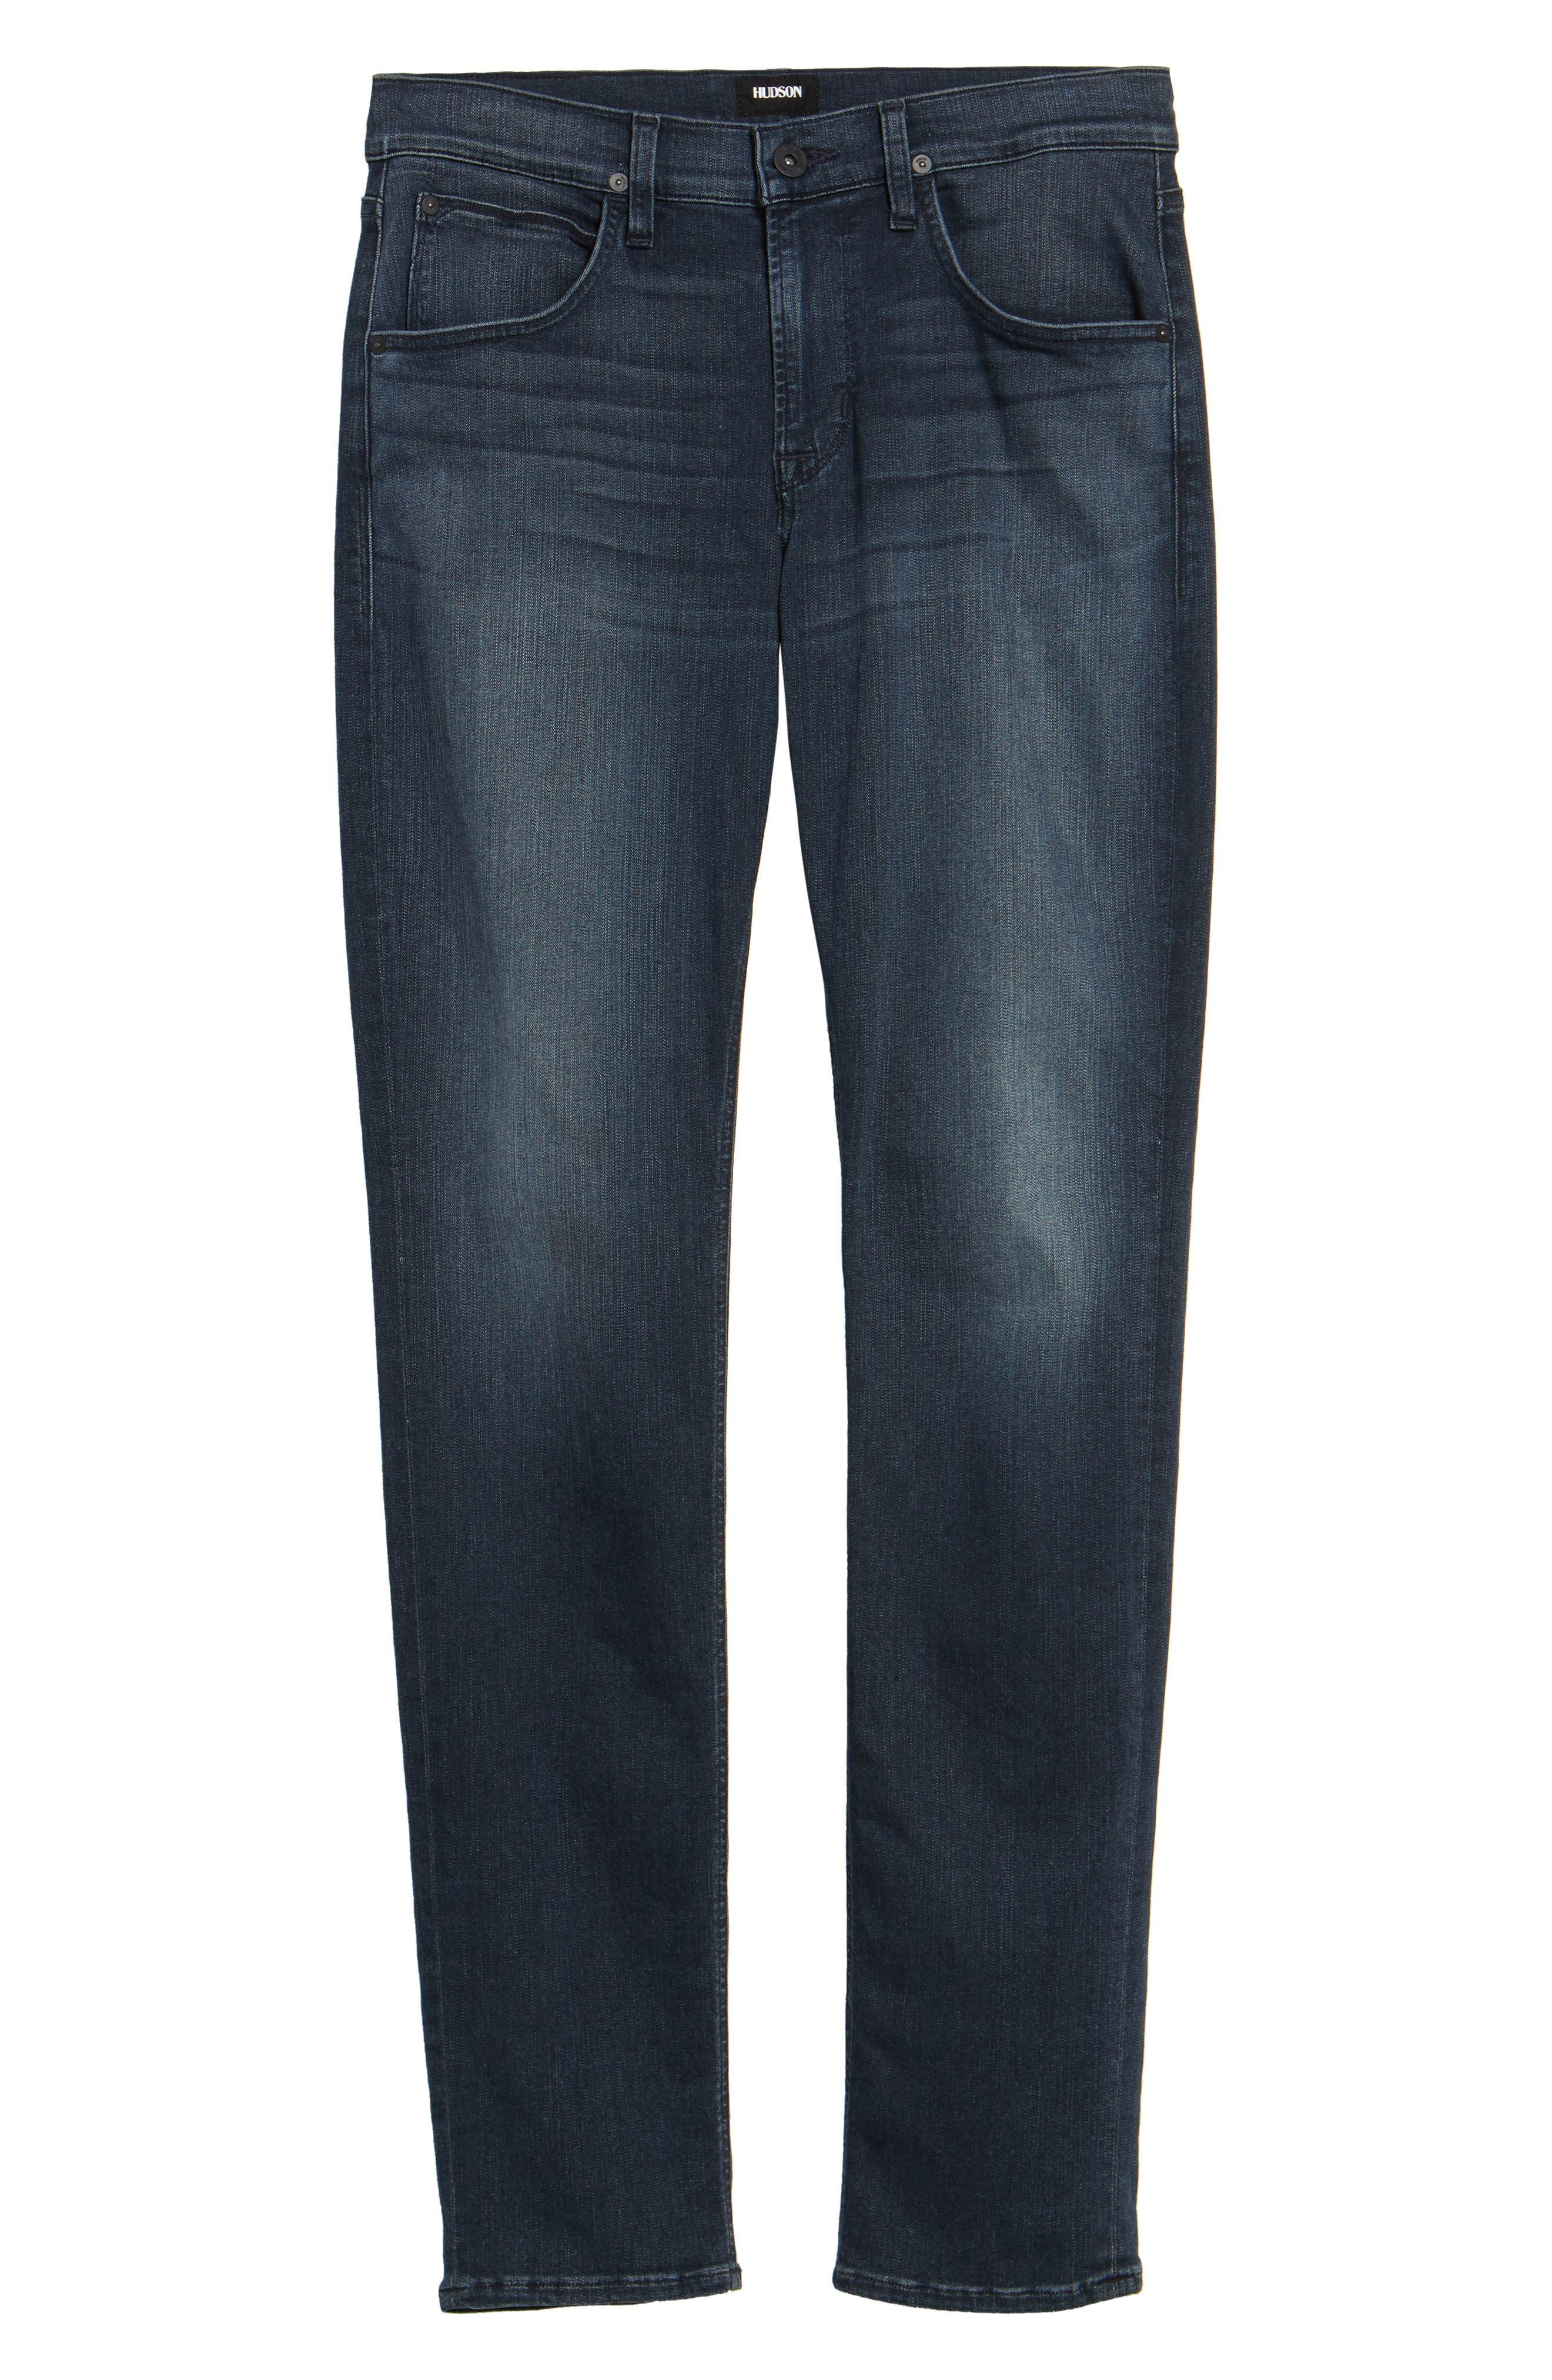 Blake Slim Fit Jeans,                             Alternate thumbnail 6, color,                             400